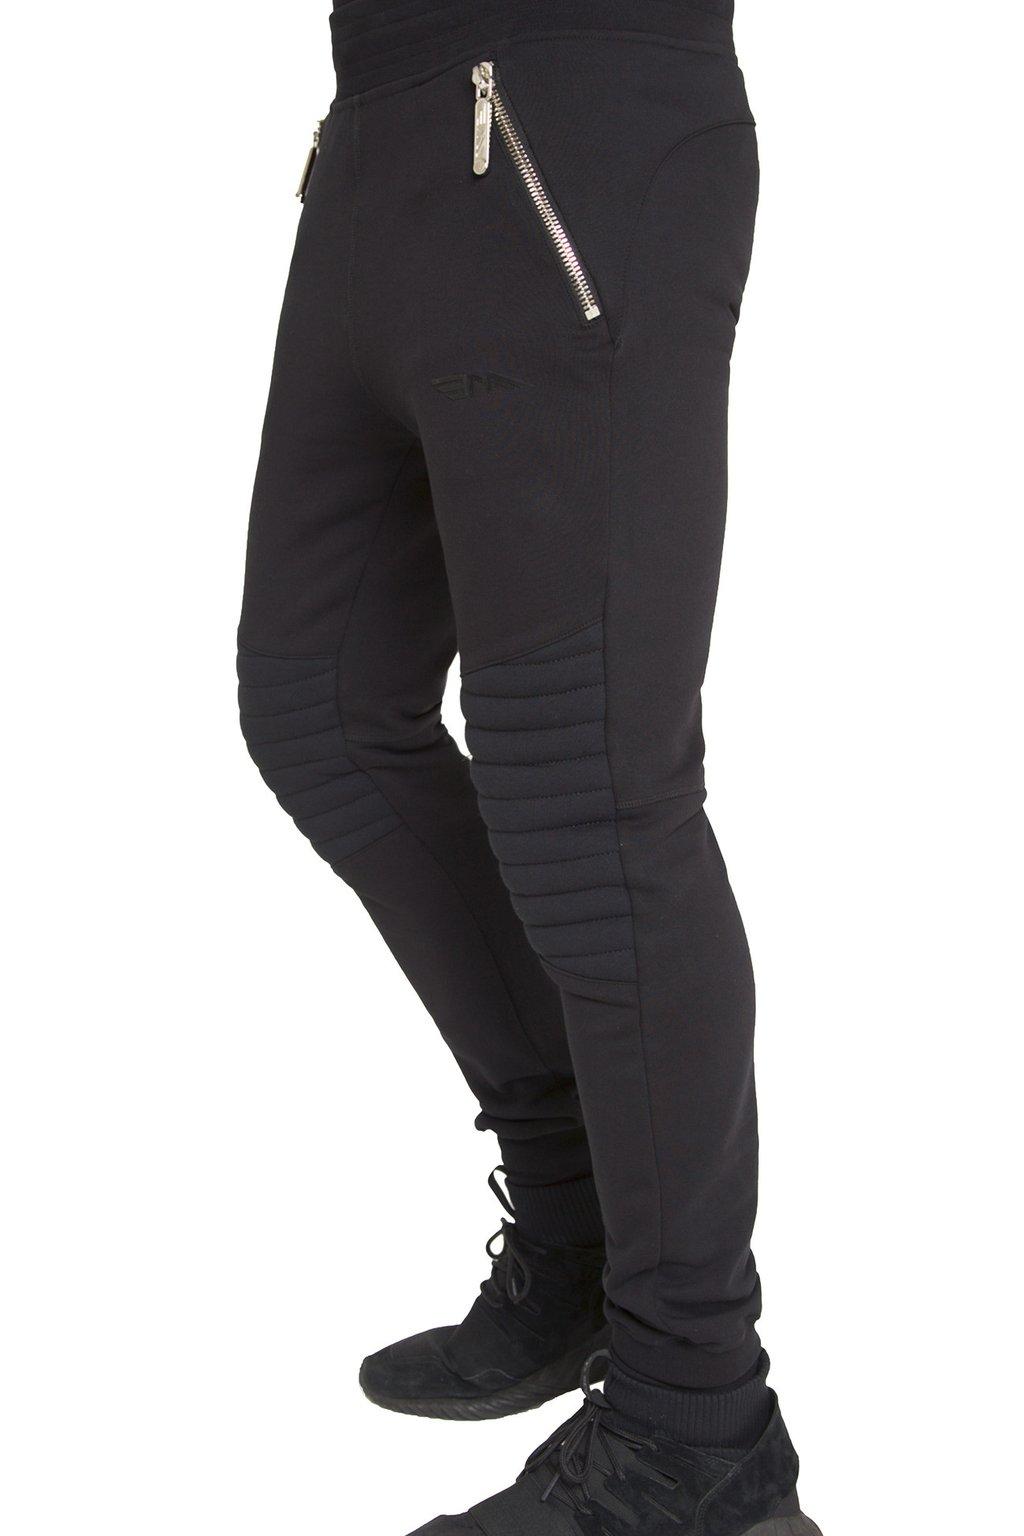 BAA-Clothing-Mens-Padded-Sweatpants-side_1024x.jpg